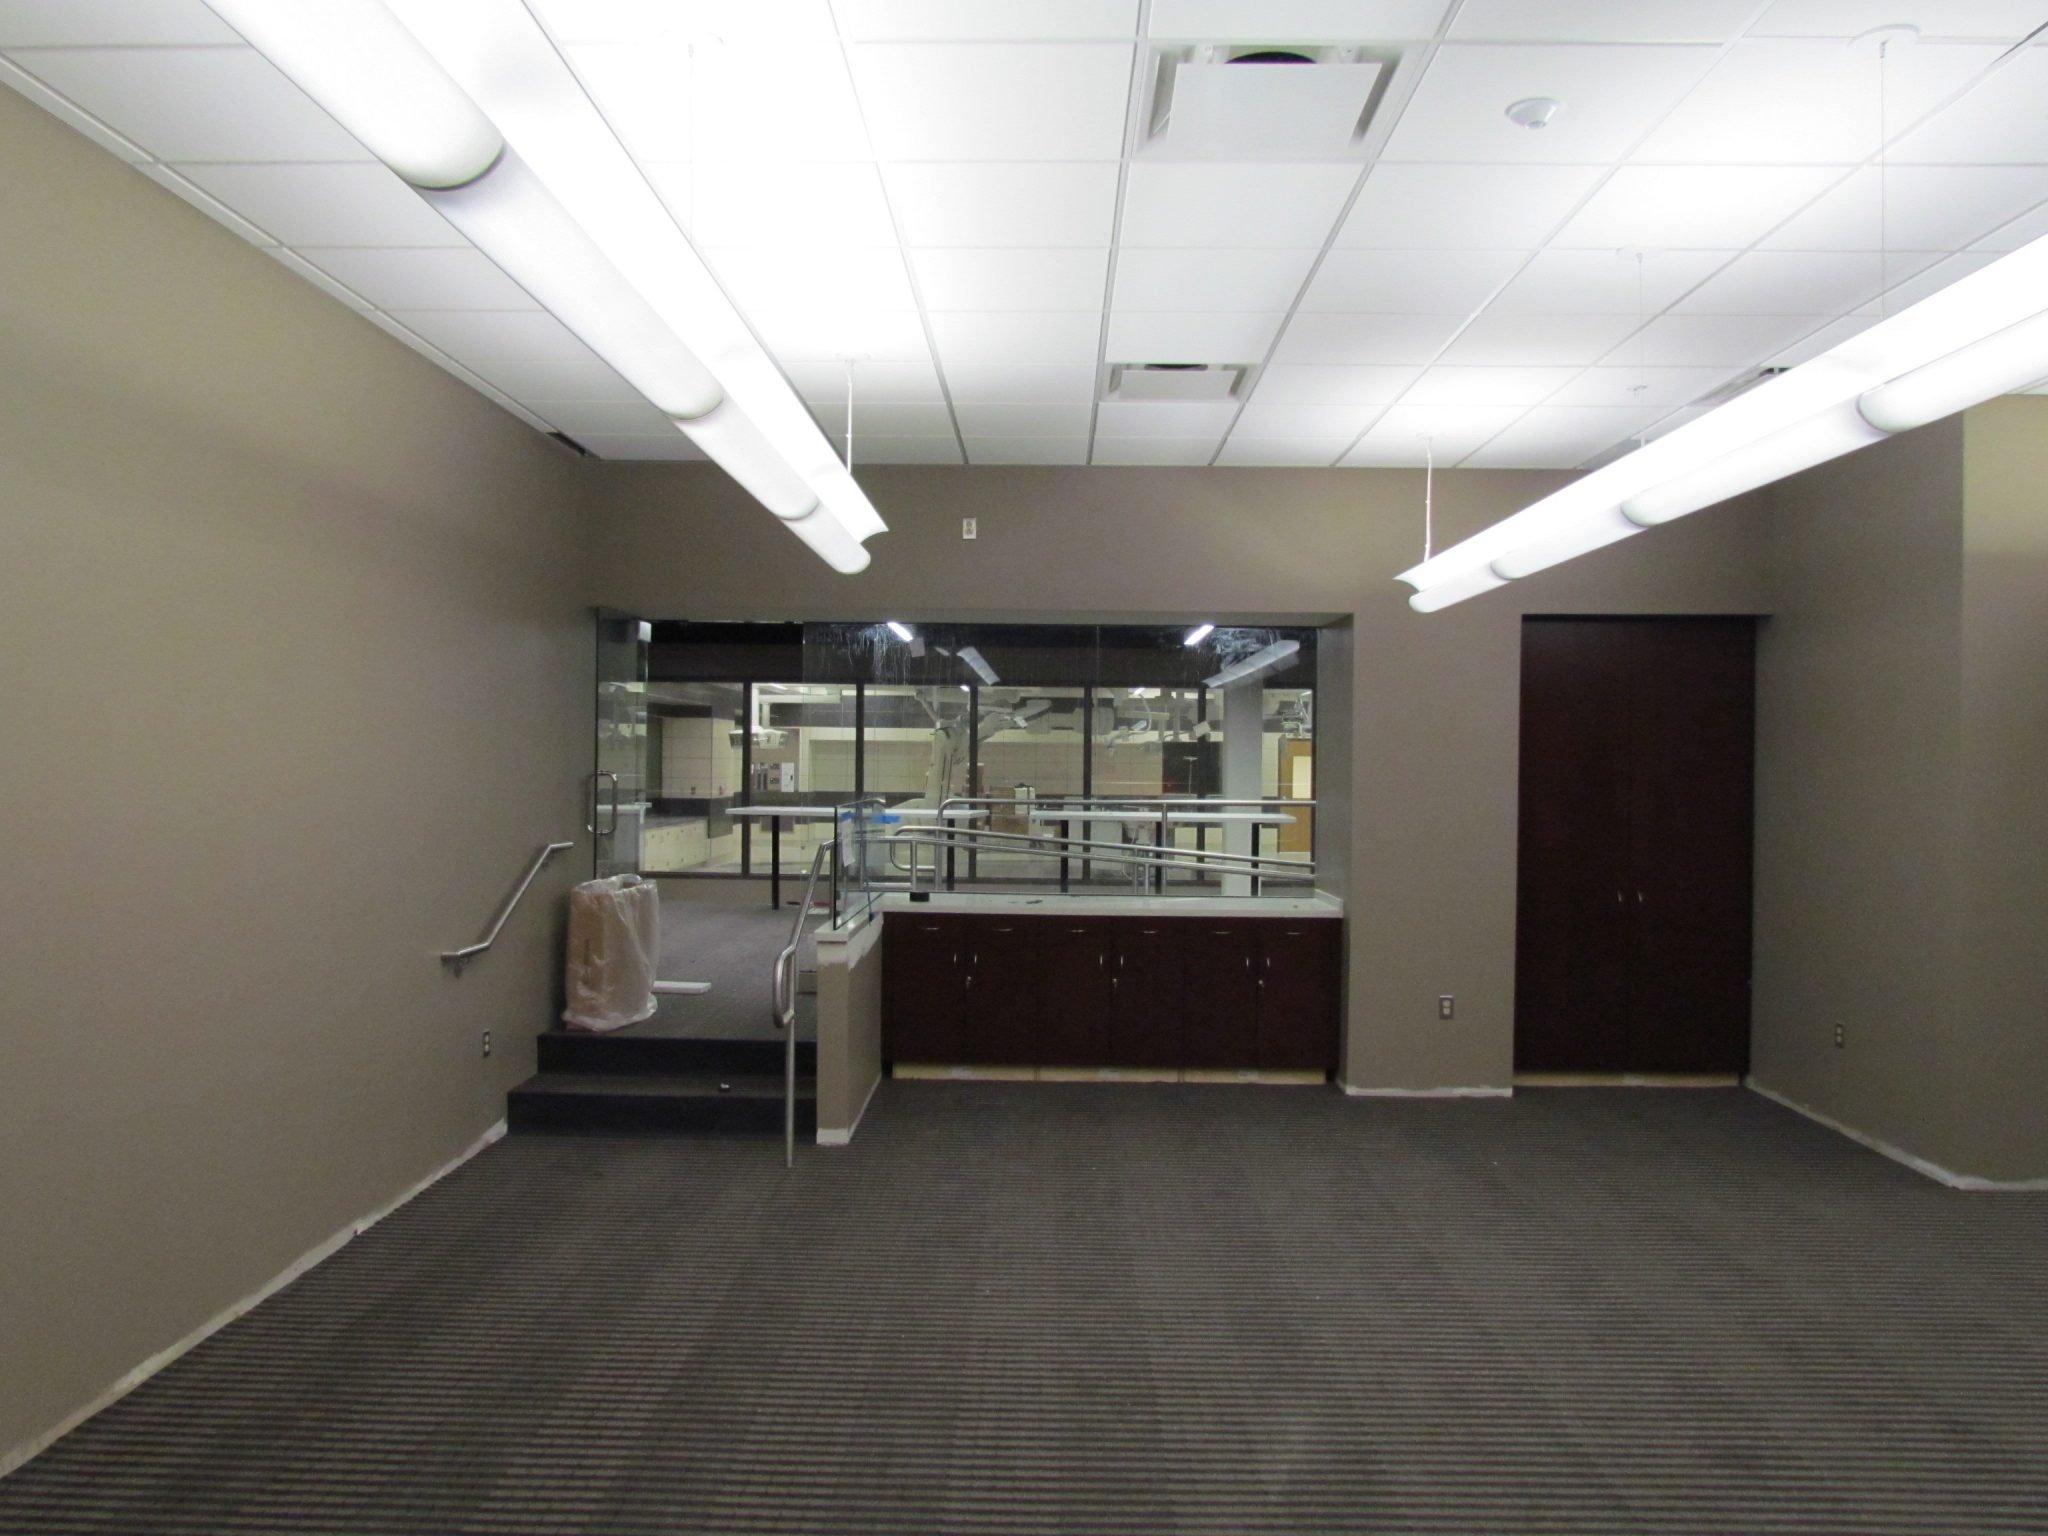 11Beaumont Hospital beige room interior with dark cabinets